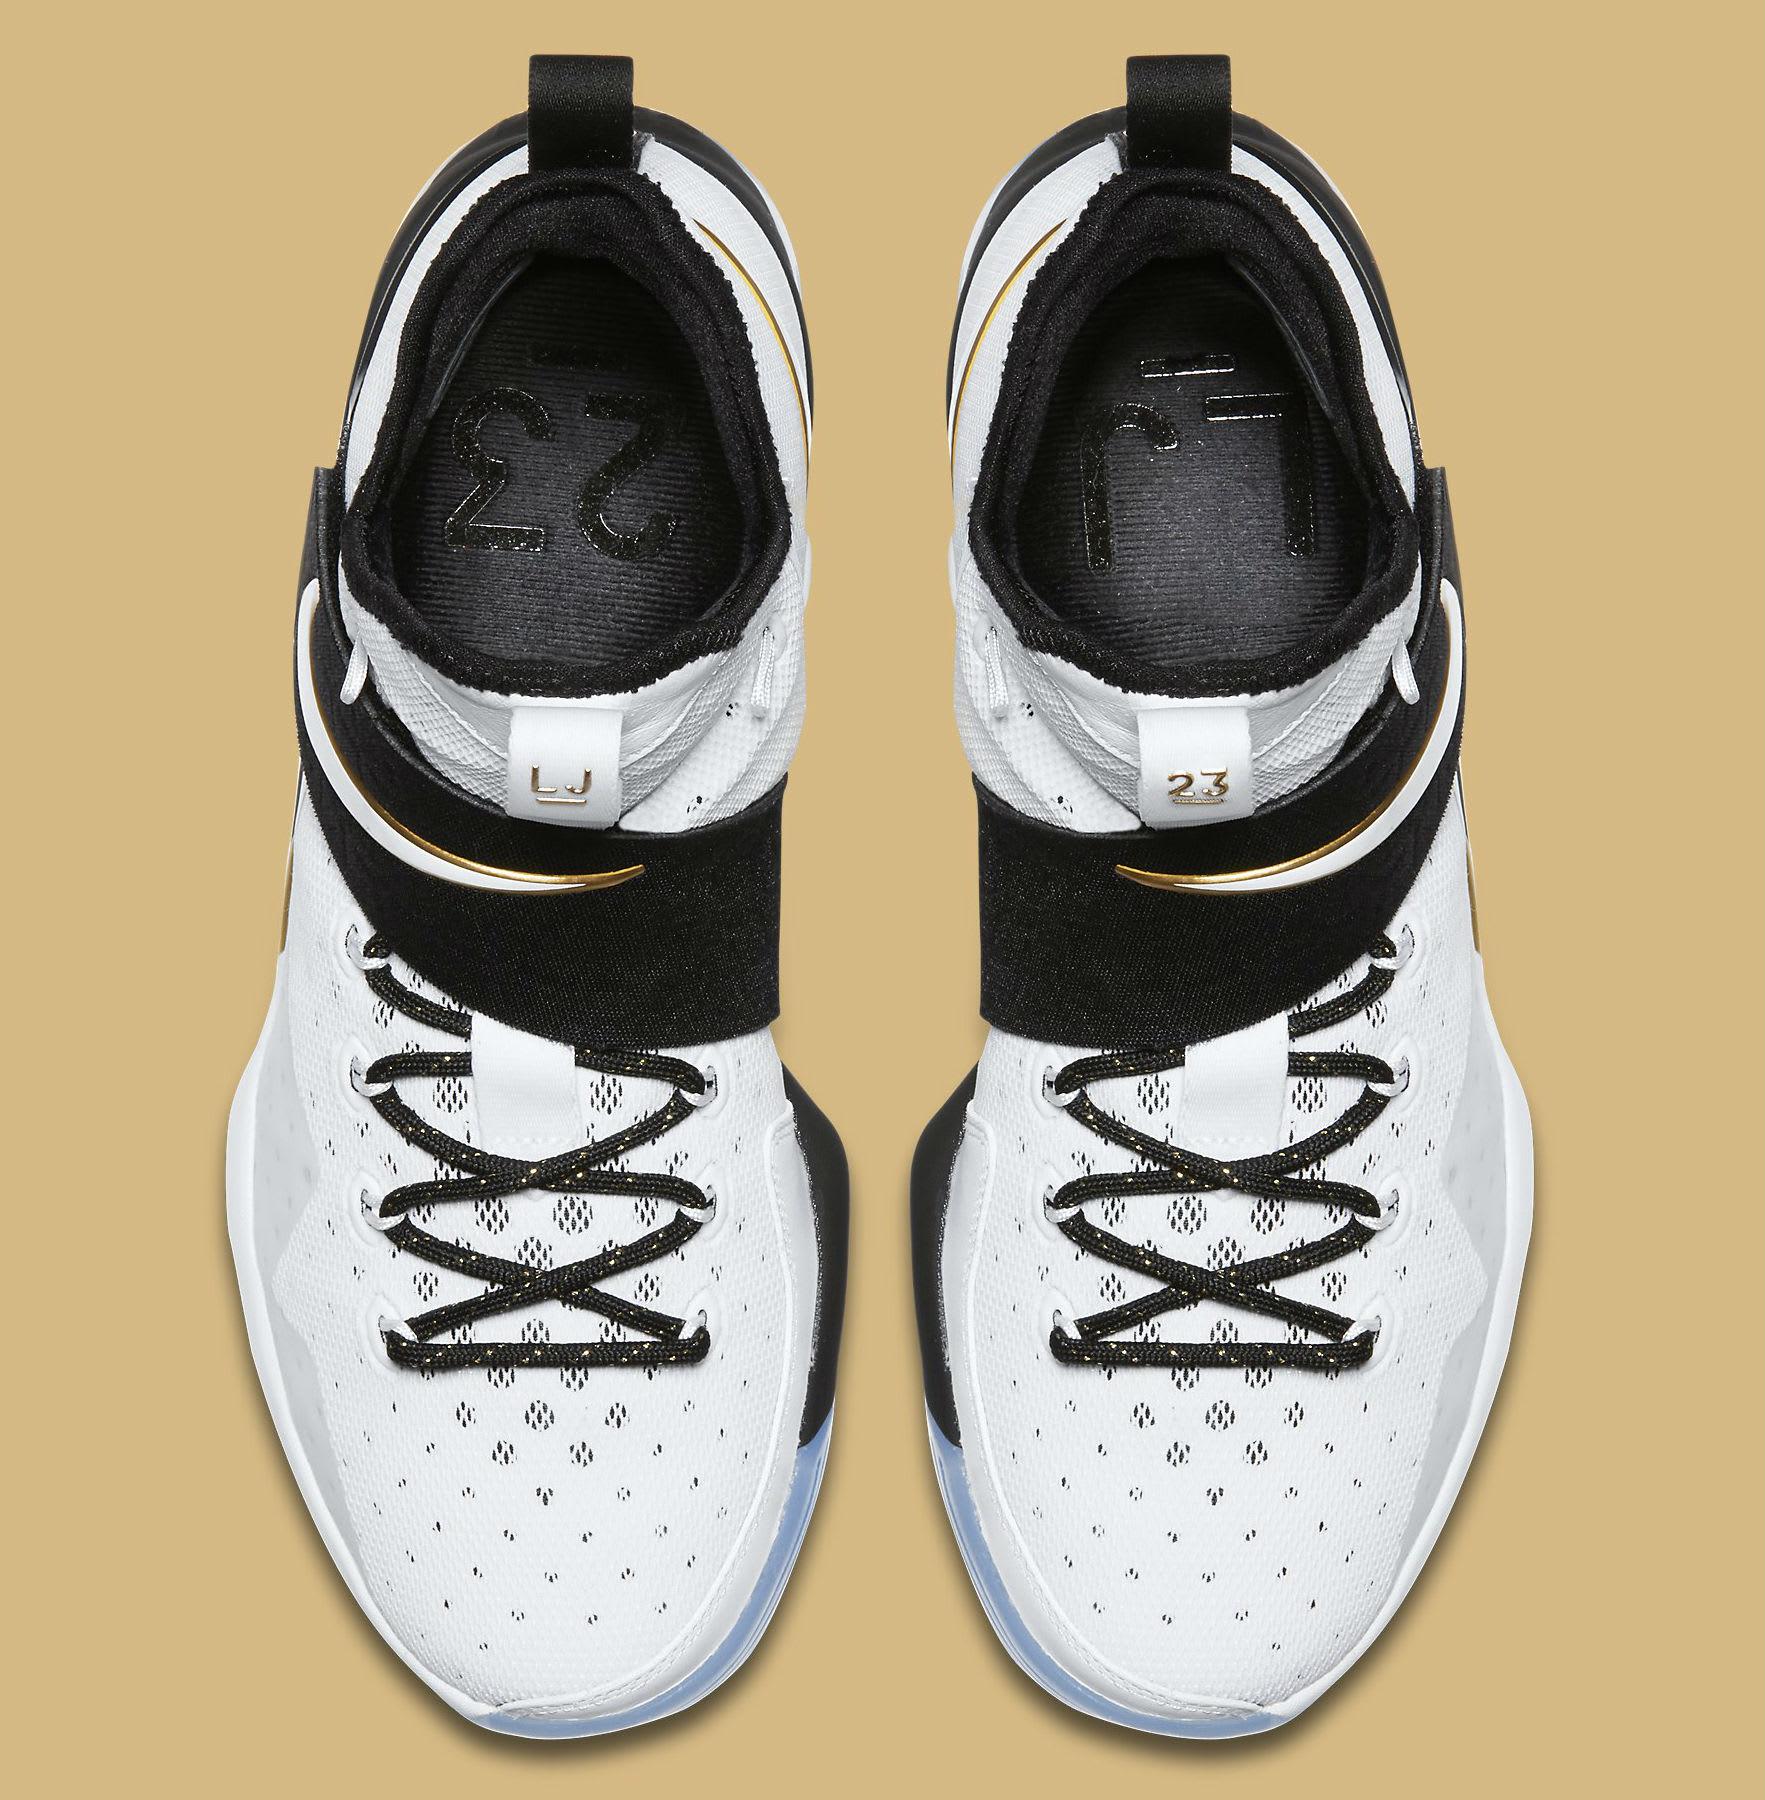 Nike LeBron 14 BHM Release Date Top 860634-100